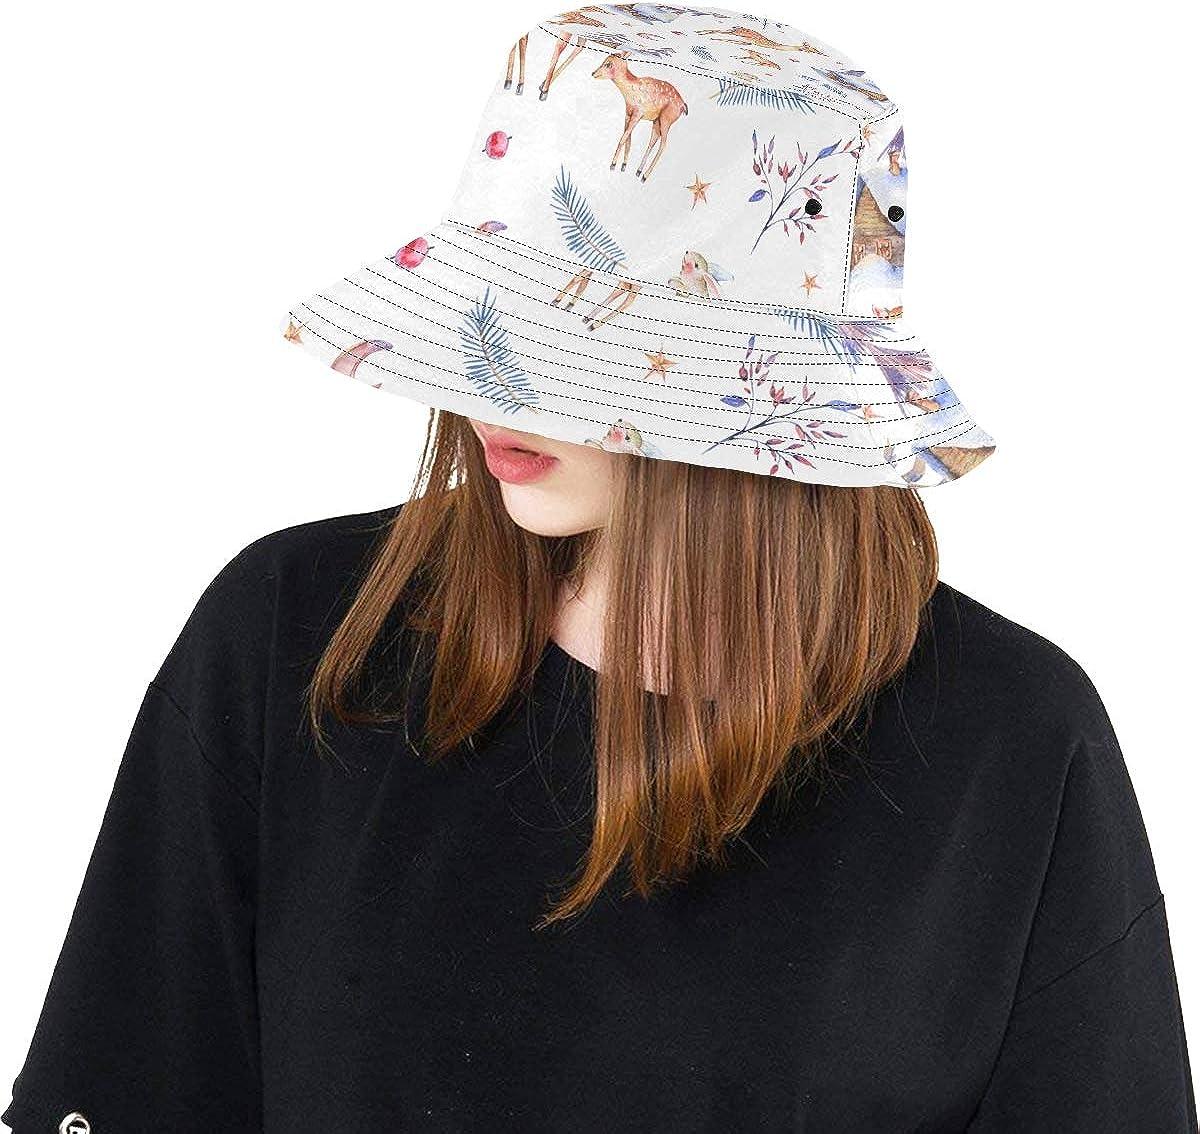 Top Hats Summer Spring Bucket Hat Deer Silhouette Art Design Fashion Fisherman Cap Travel Rain Picnic Hat for Women Girls